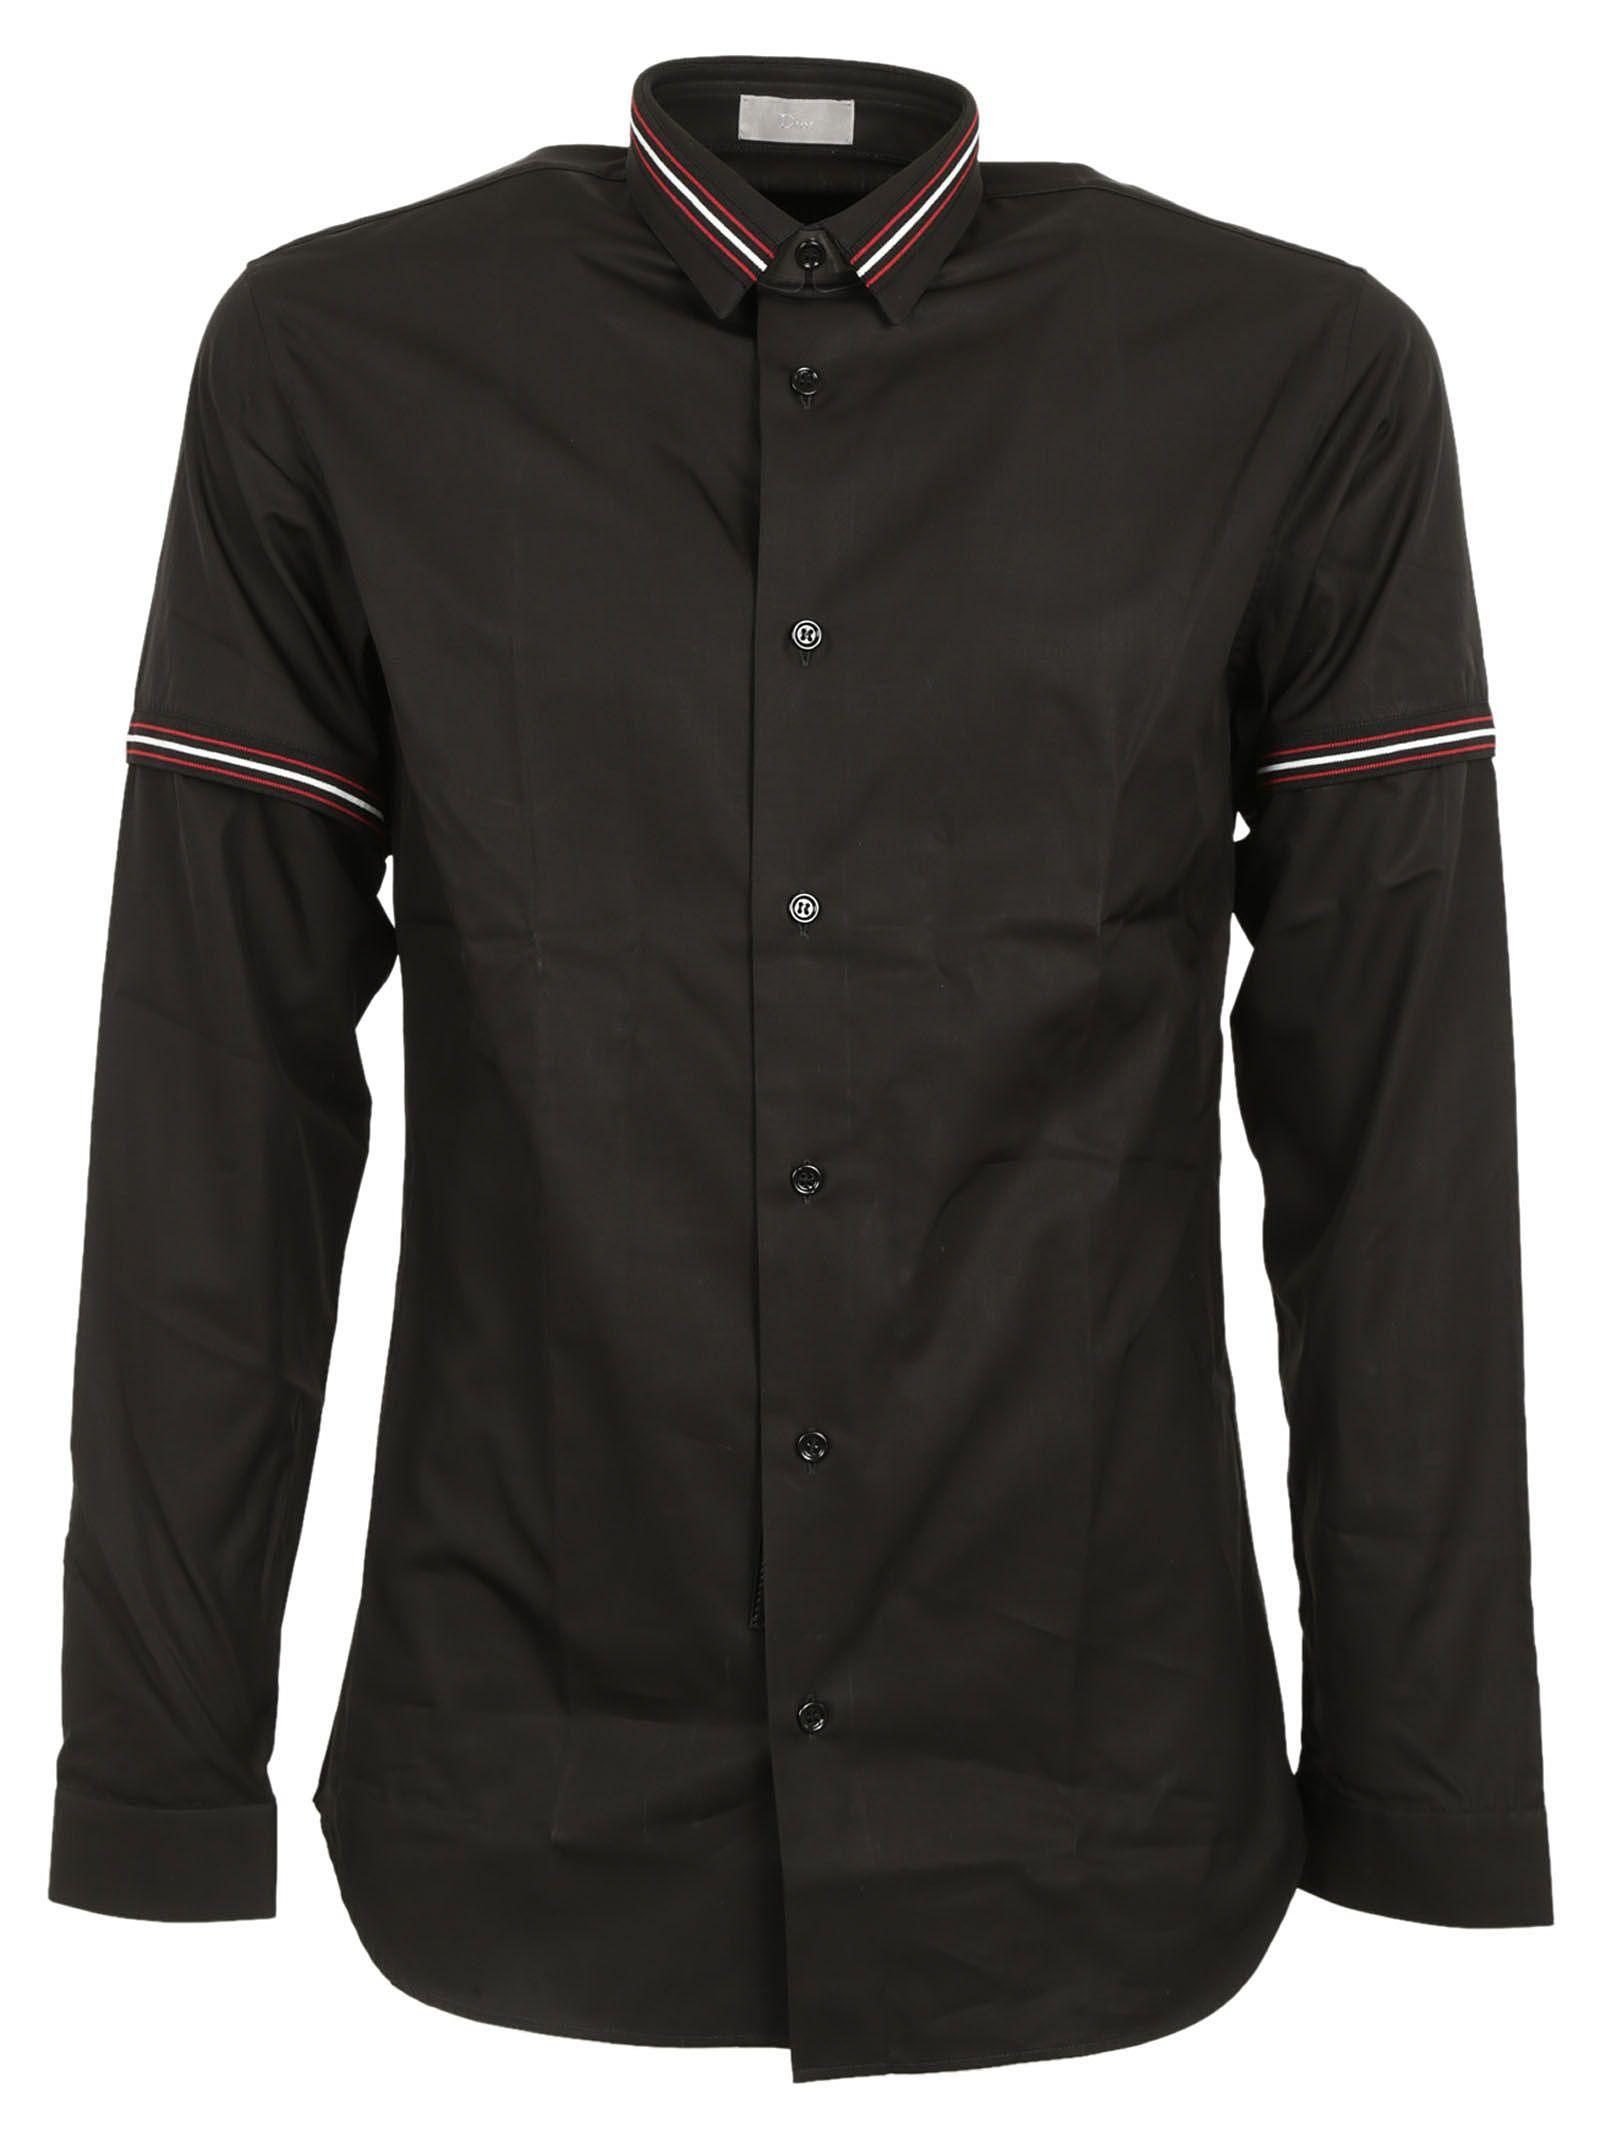 Dior Homme Striped Collar Shirt